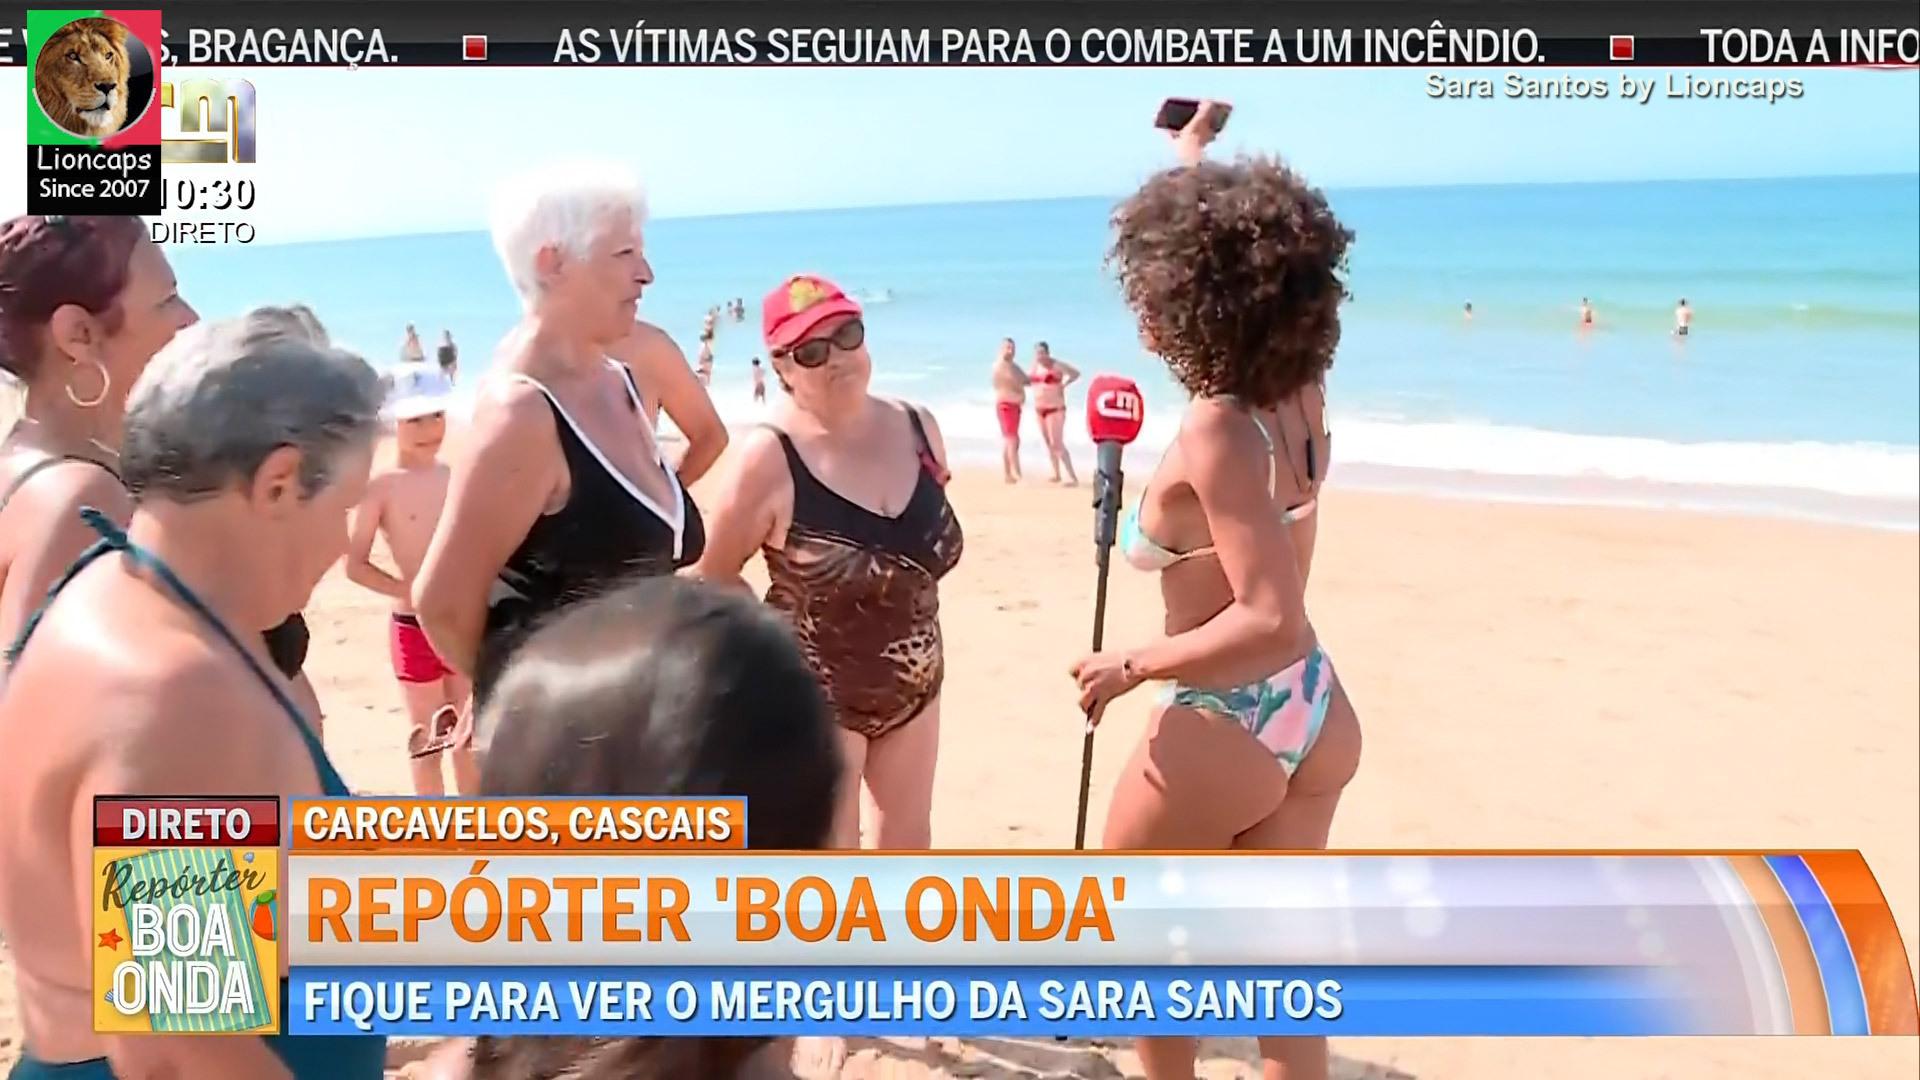 sara_santos_praia_lioncaps_24_07_2021_01 (12).jpg